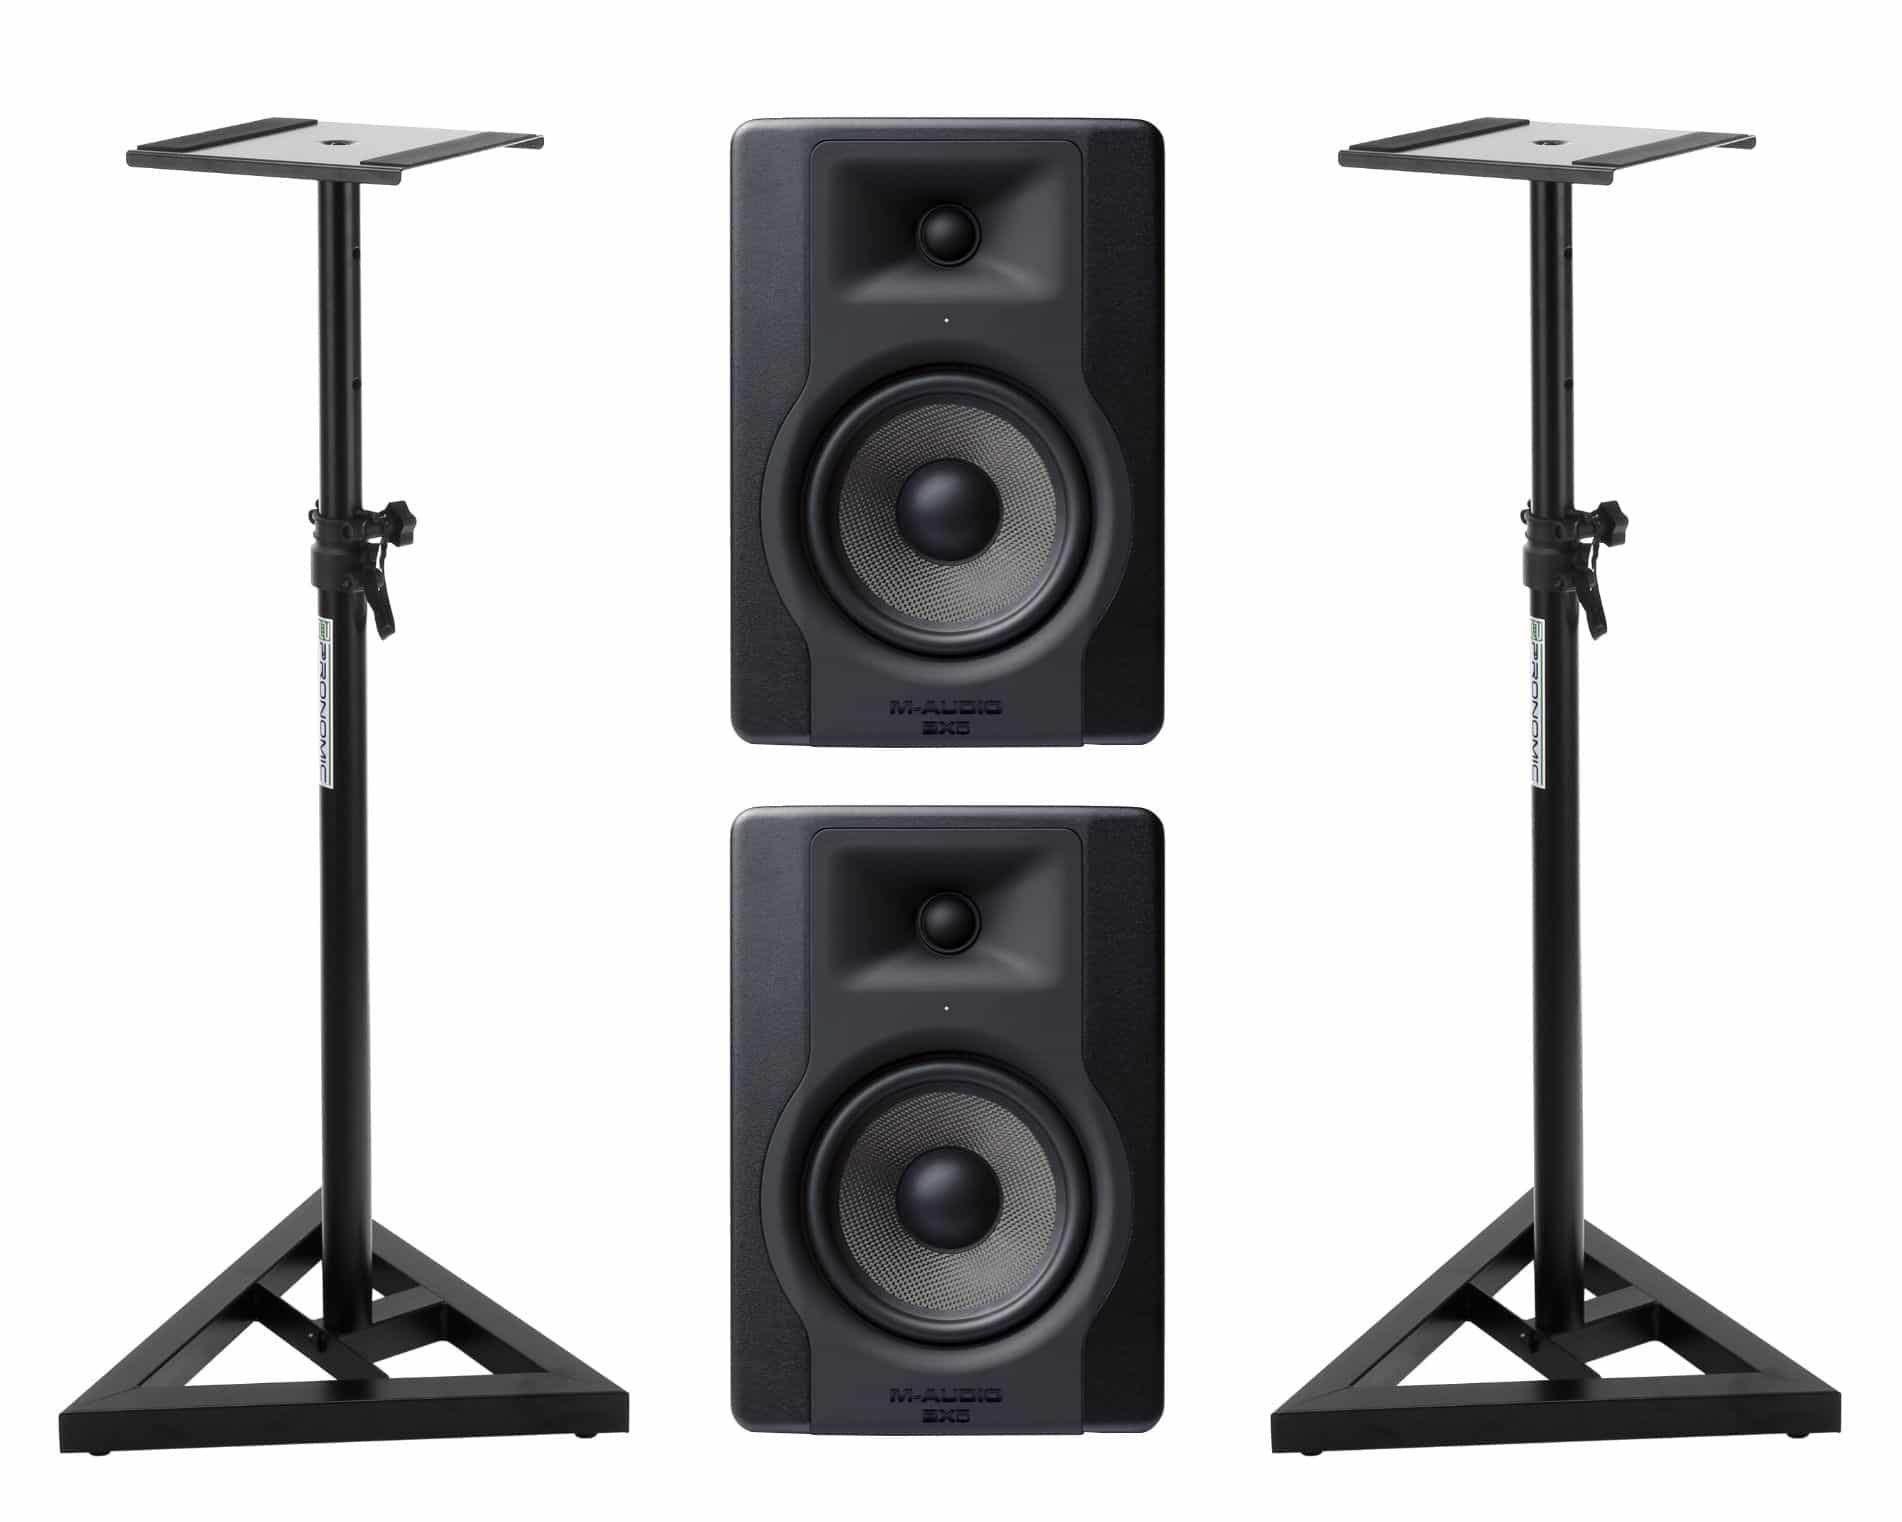 Studiomonitore - M Audio BX5 D3 Studiomonitor Stativ Set - Onlineshop Musikhaus Kirstein